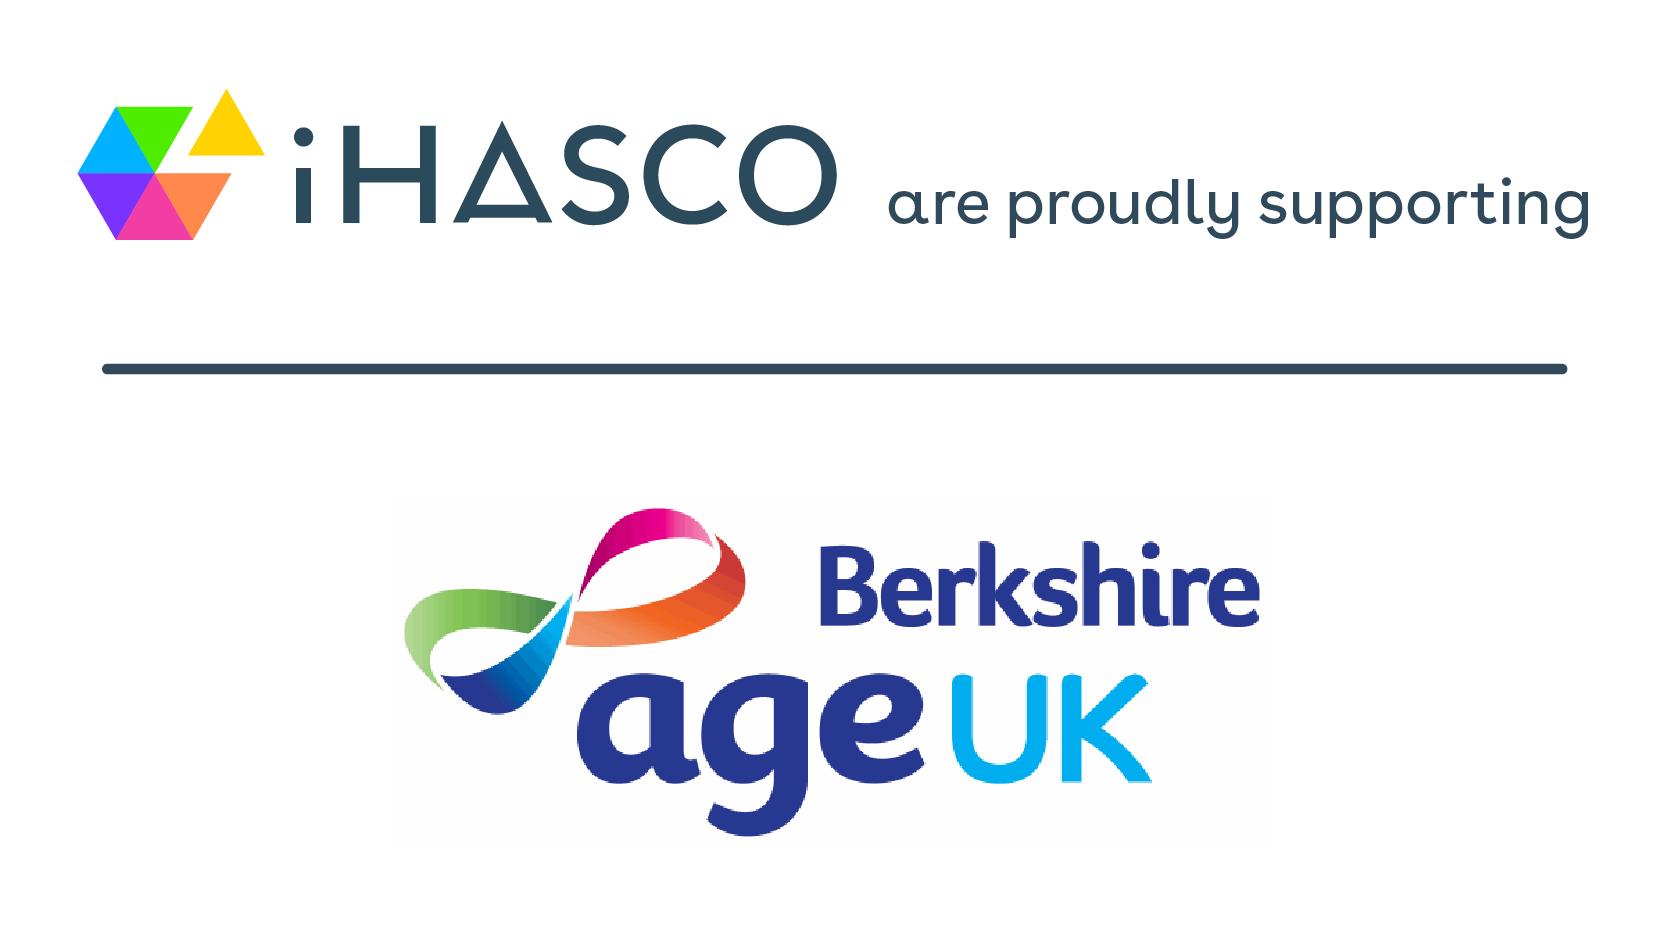 Age UK Berkshire logo and iHASCO logo to announce new charity partnership